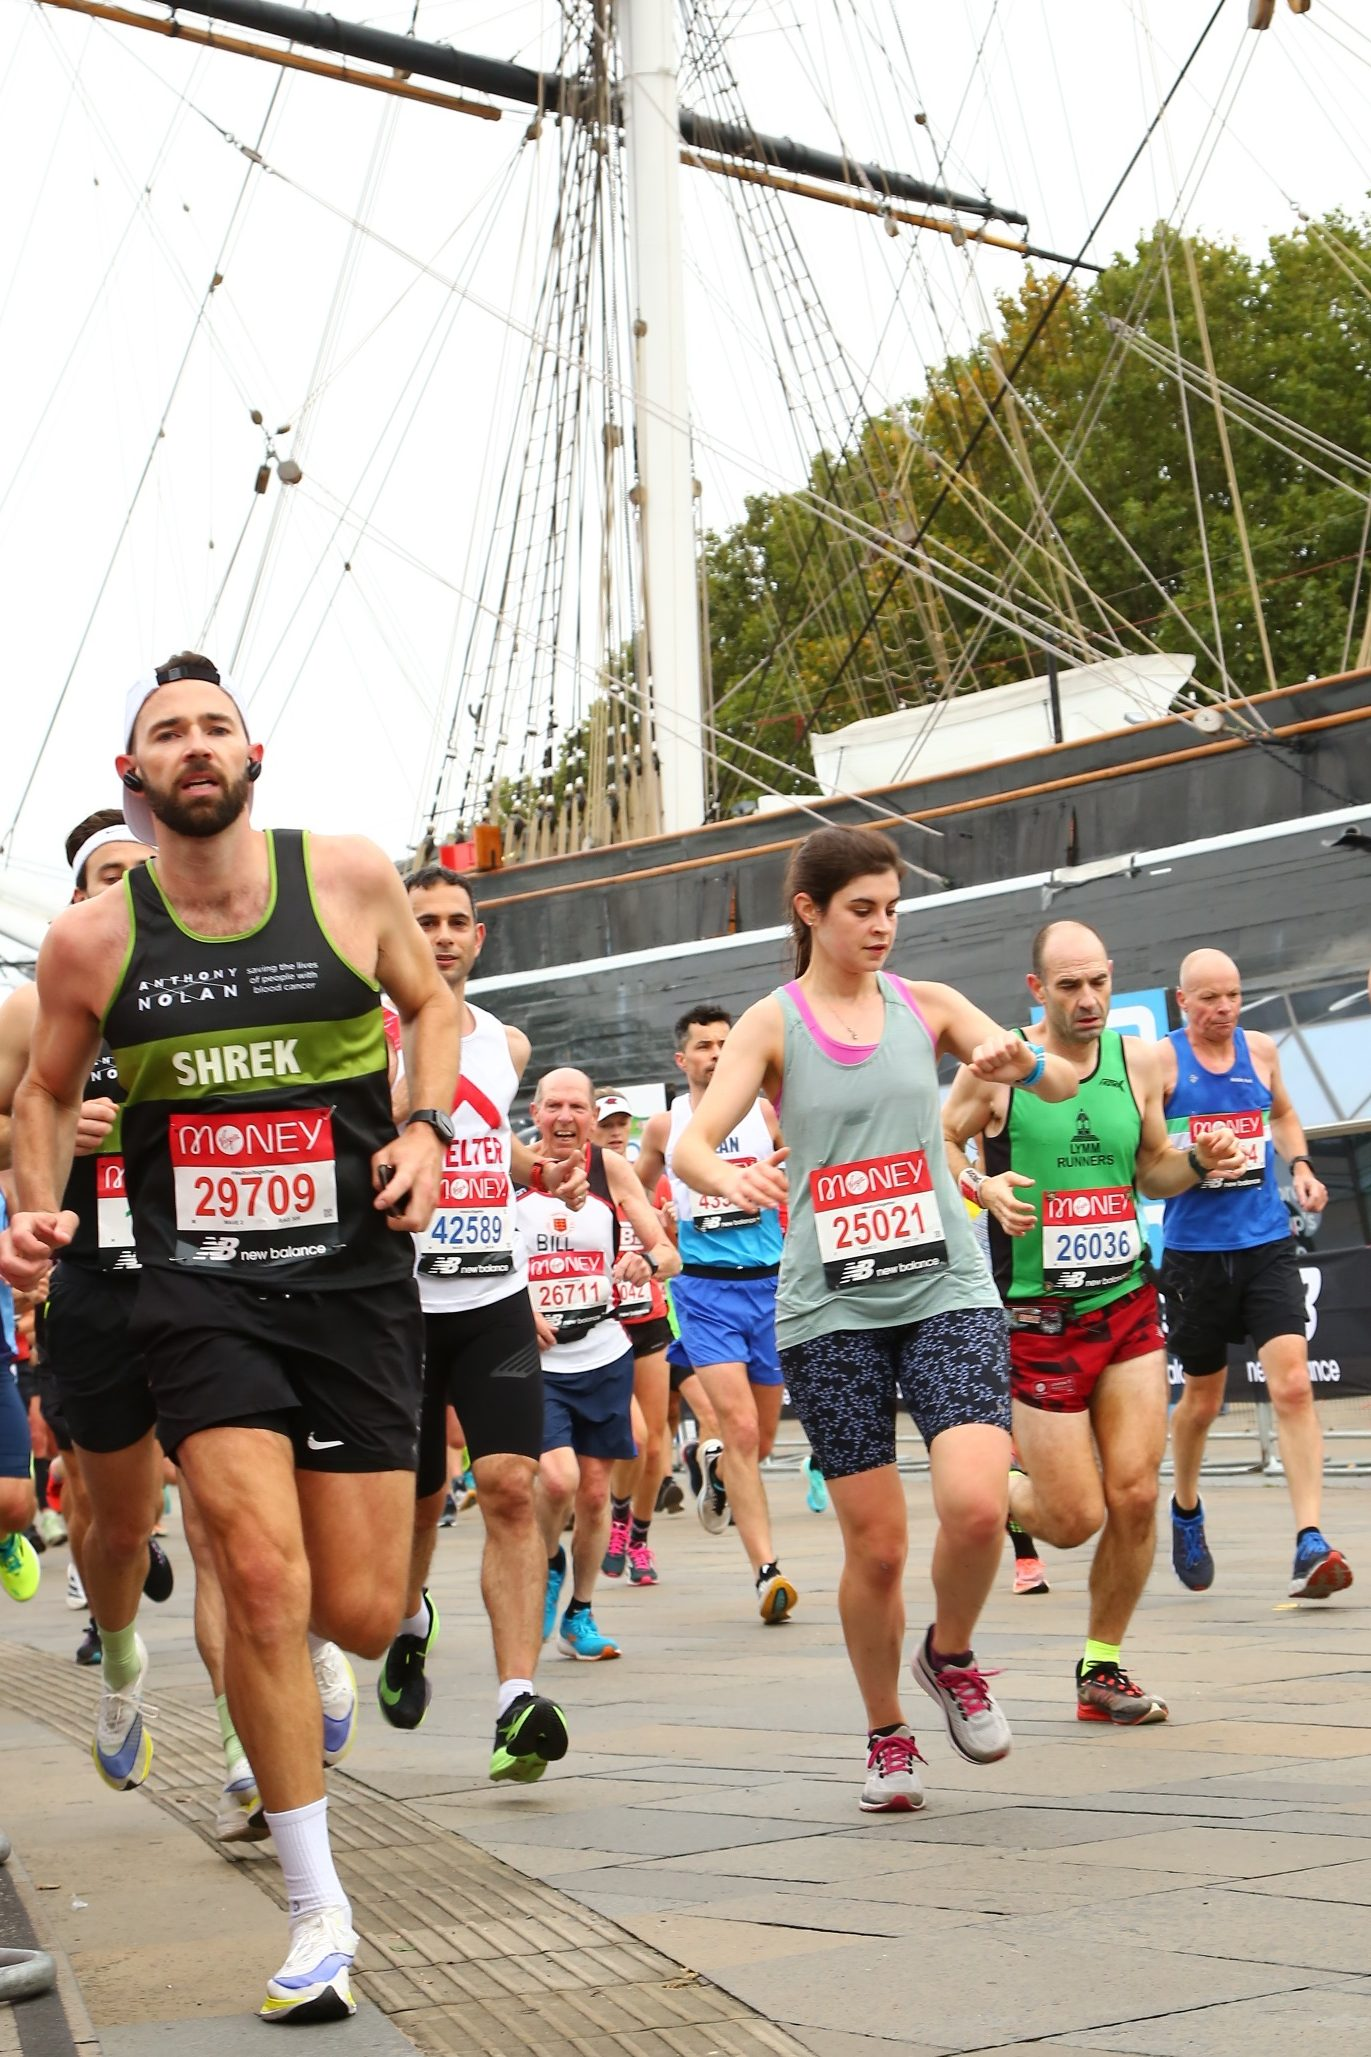 London Marathon - Cutty Sark